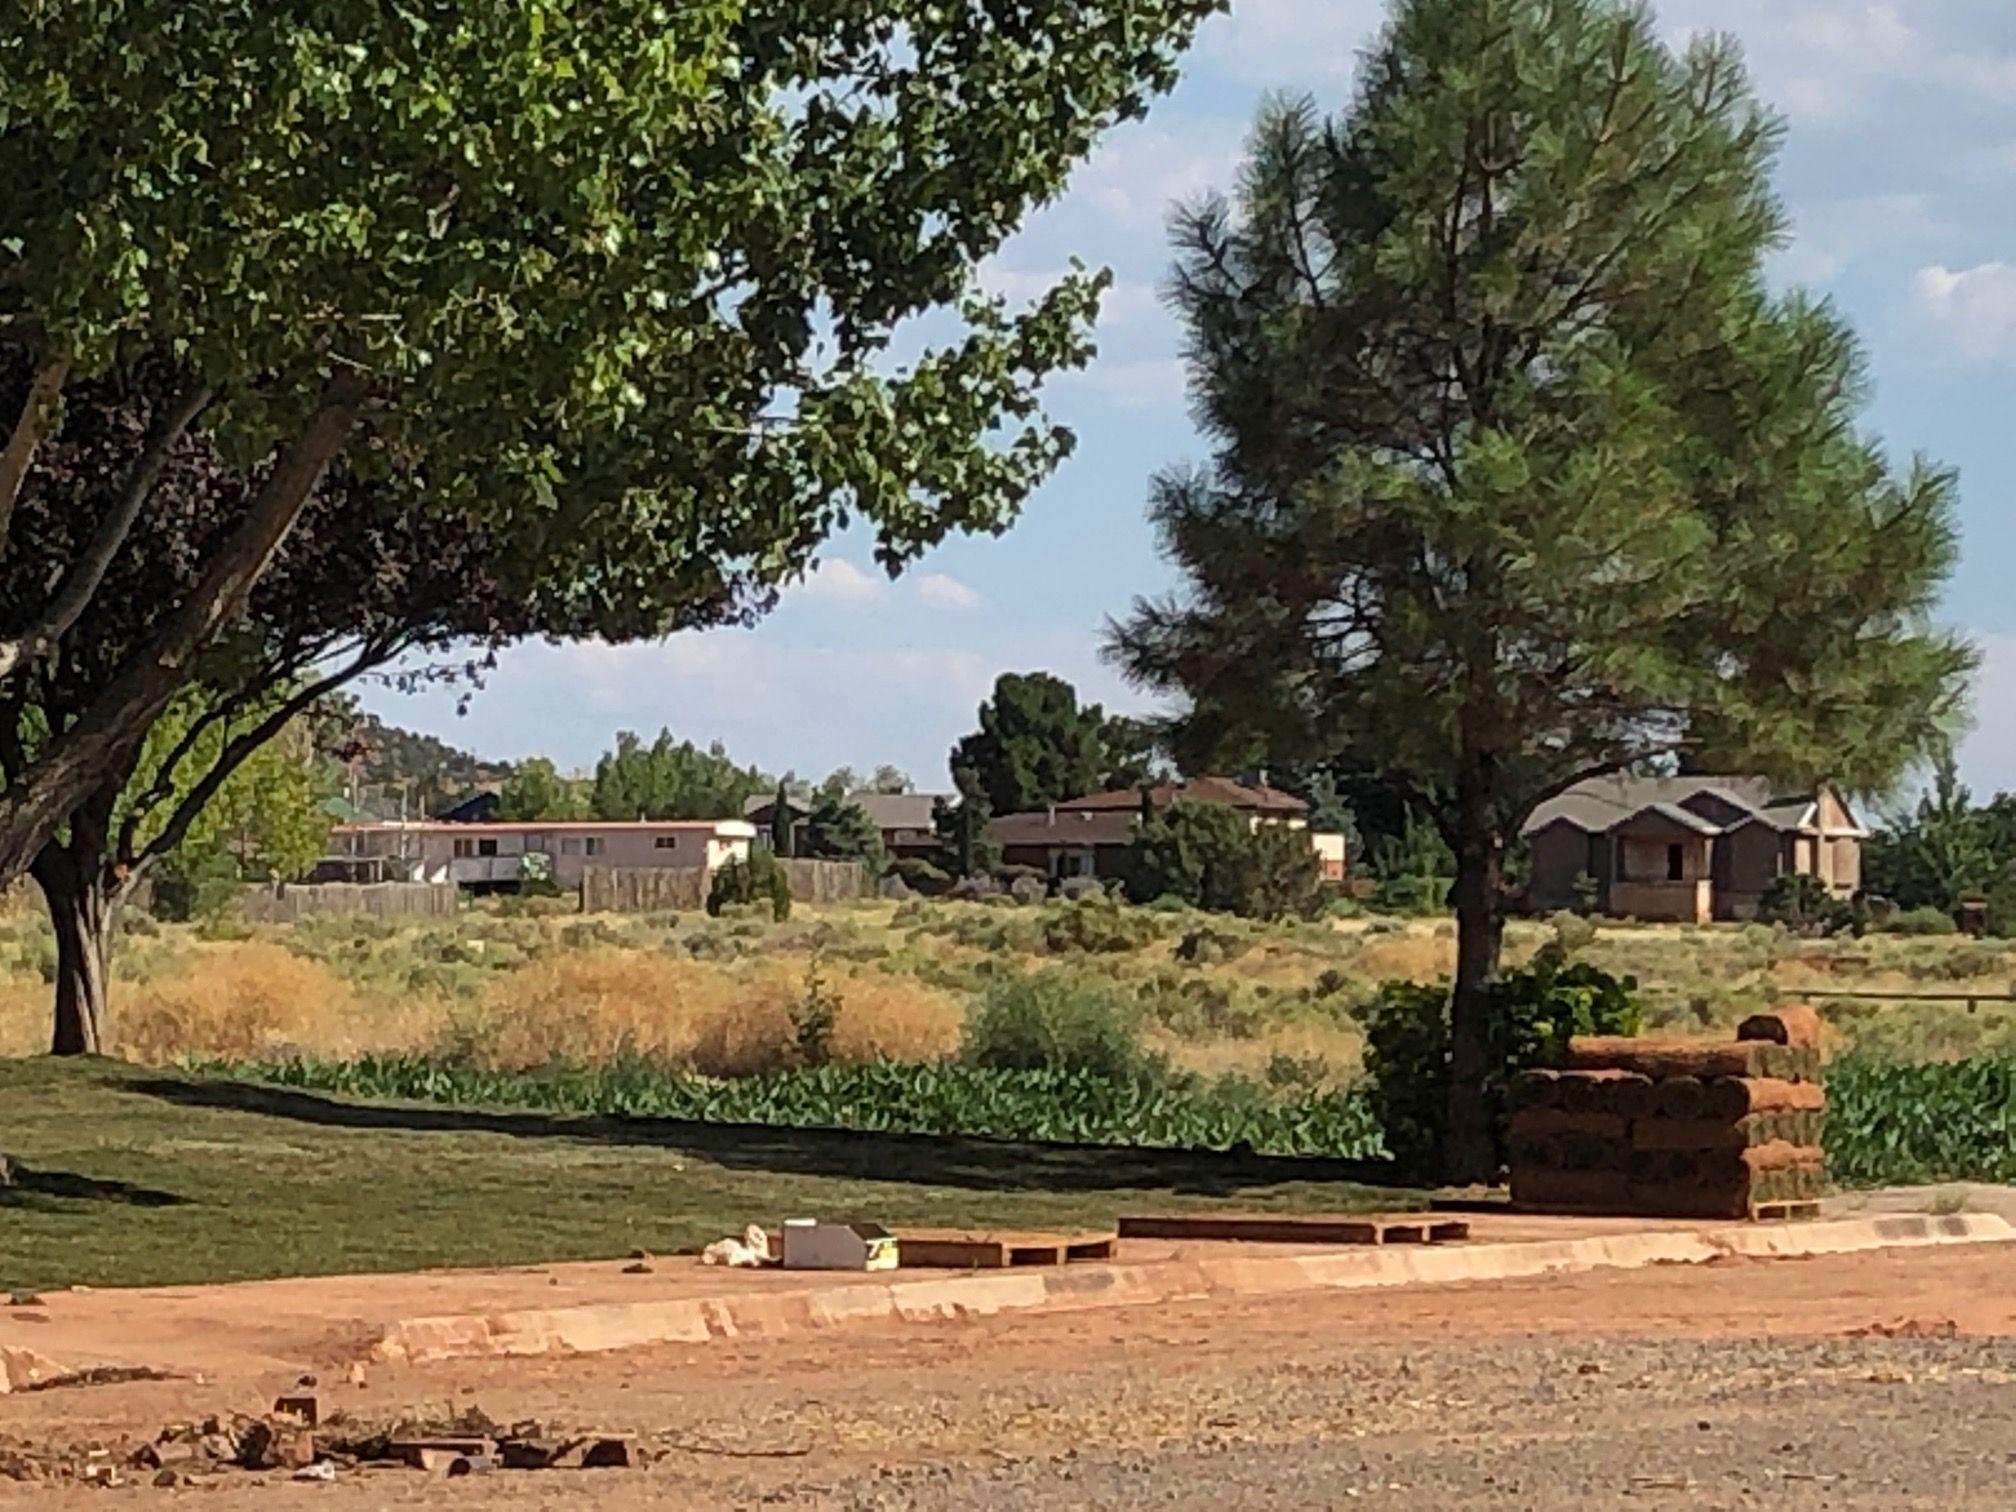 Creek Valley Health Center in polygamist community of Colorado City AZ